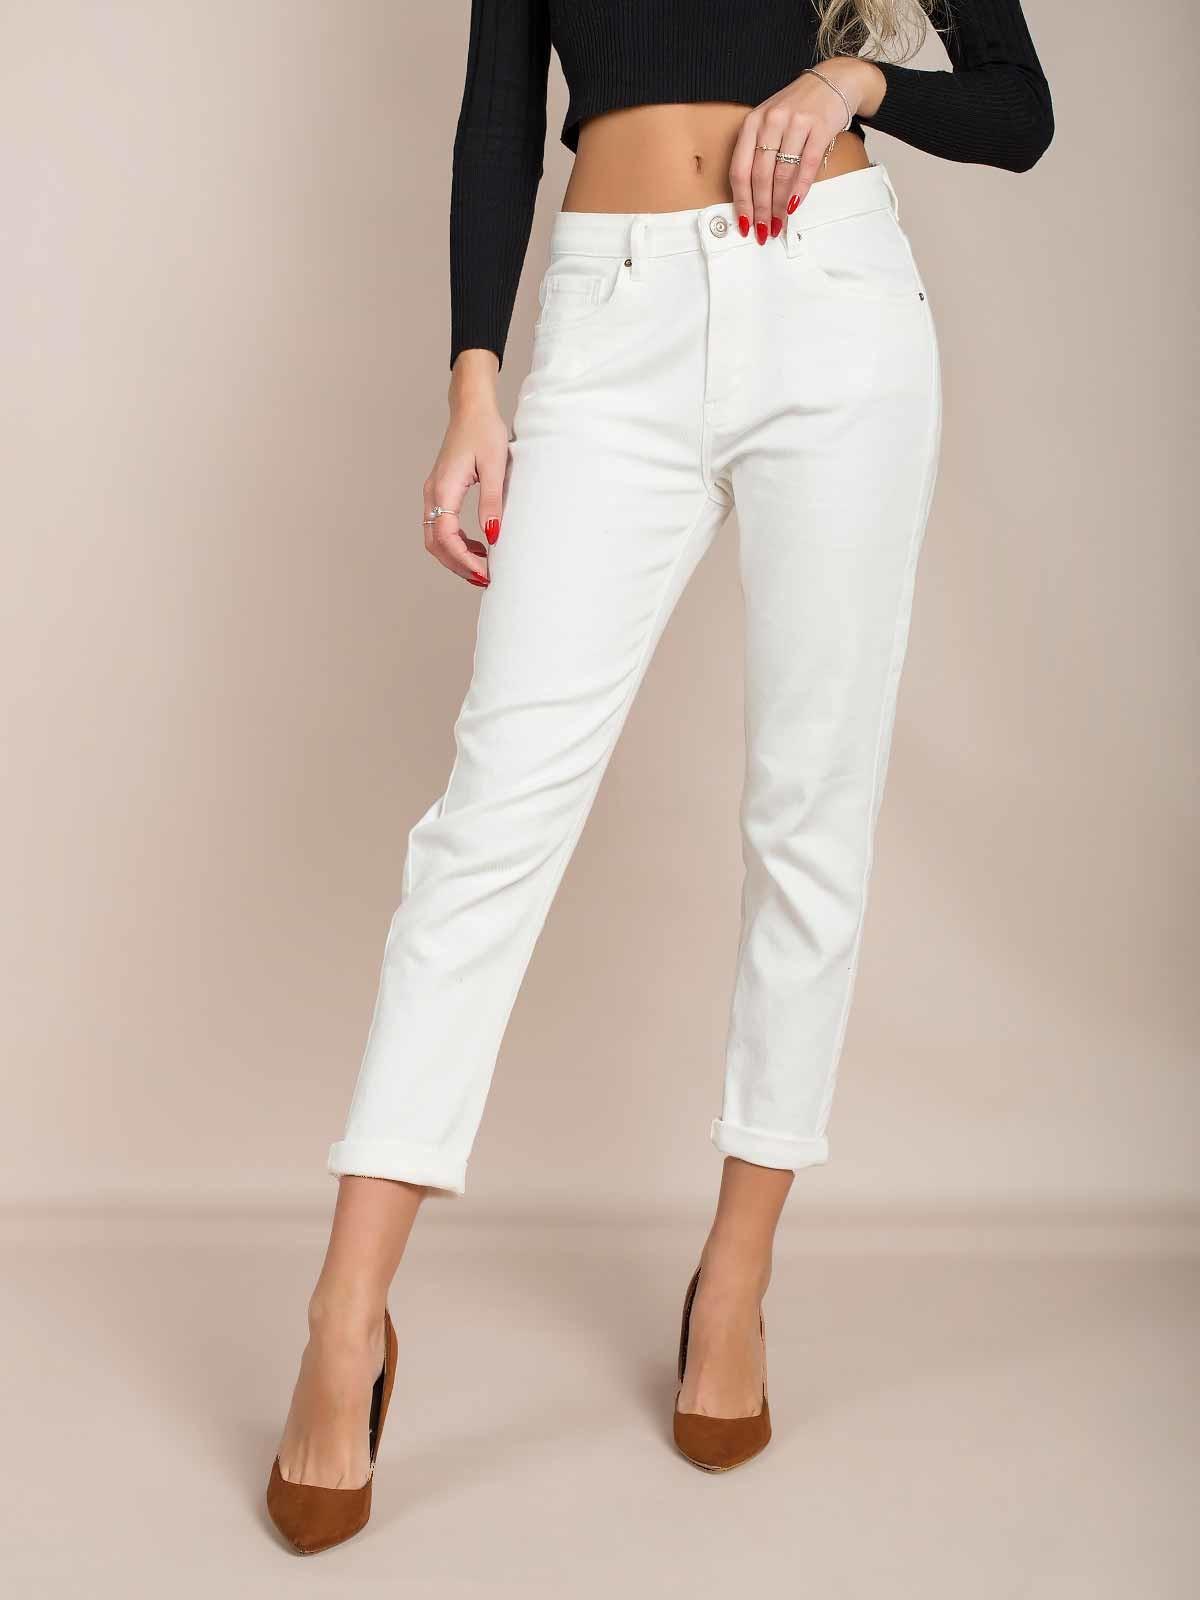 Pantalones vaqueros blancos slim fit